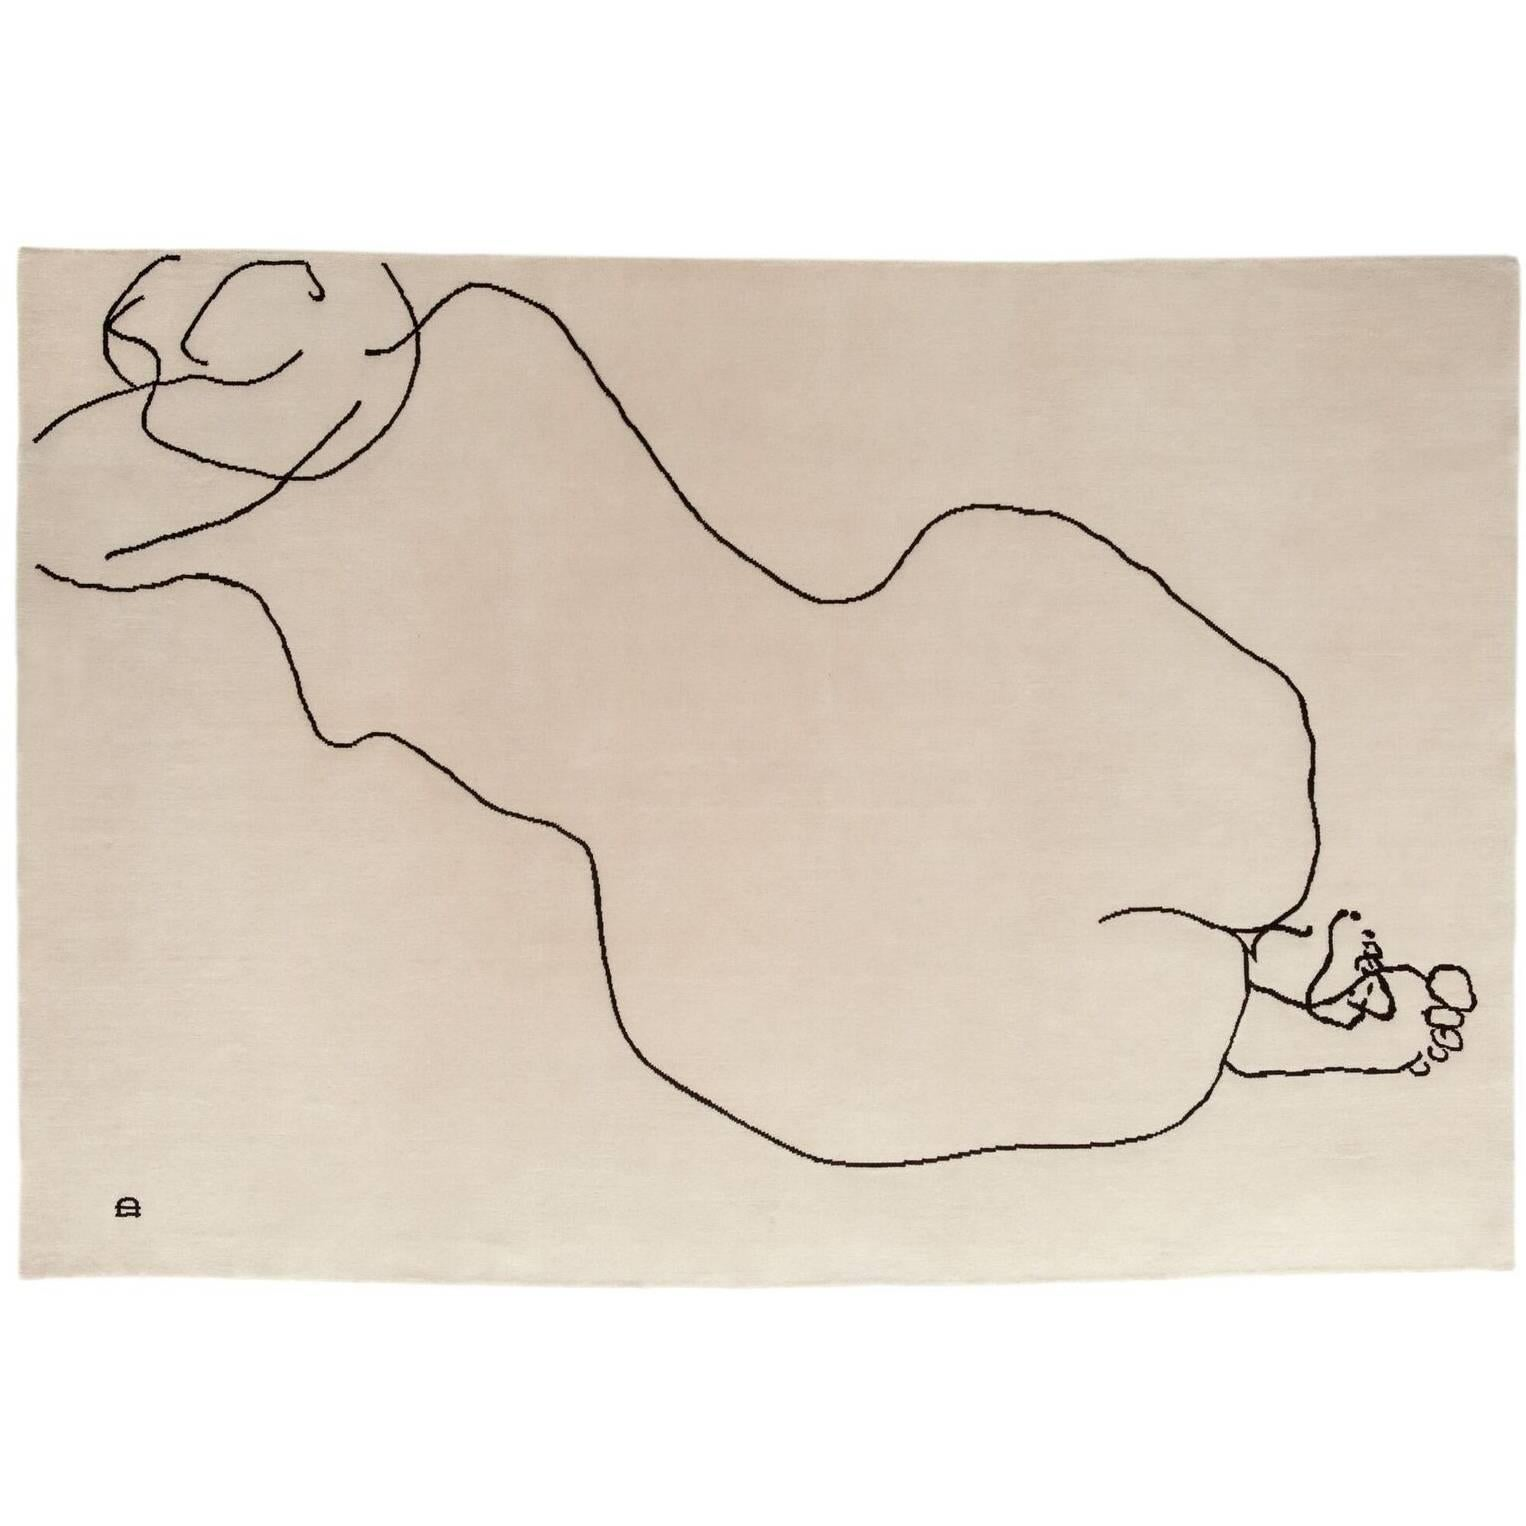 Figura Humana 1948 Hand-Knotted Wool Area Rug by Eduardo Chillida